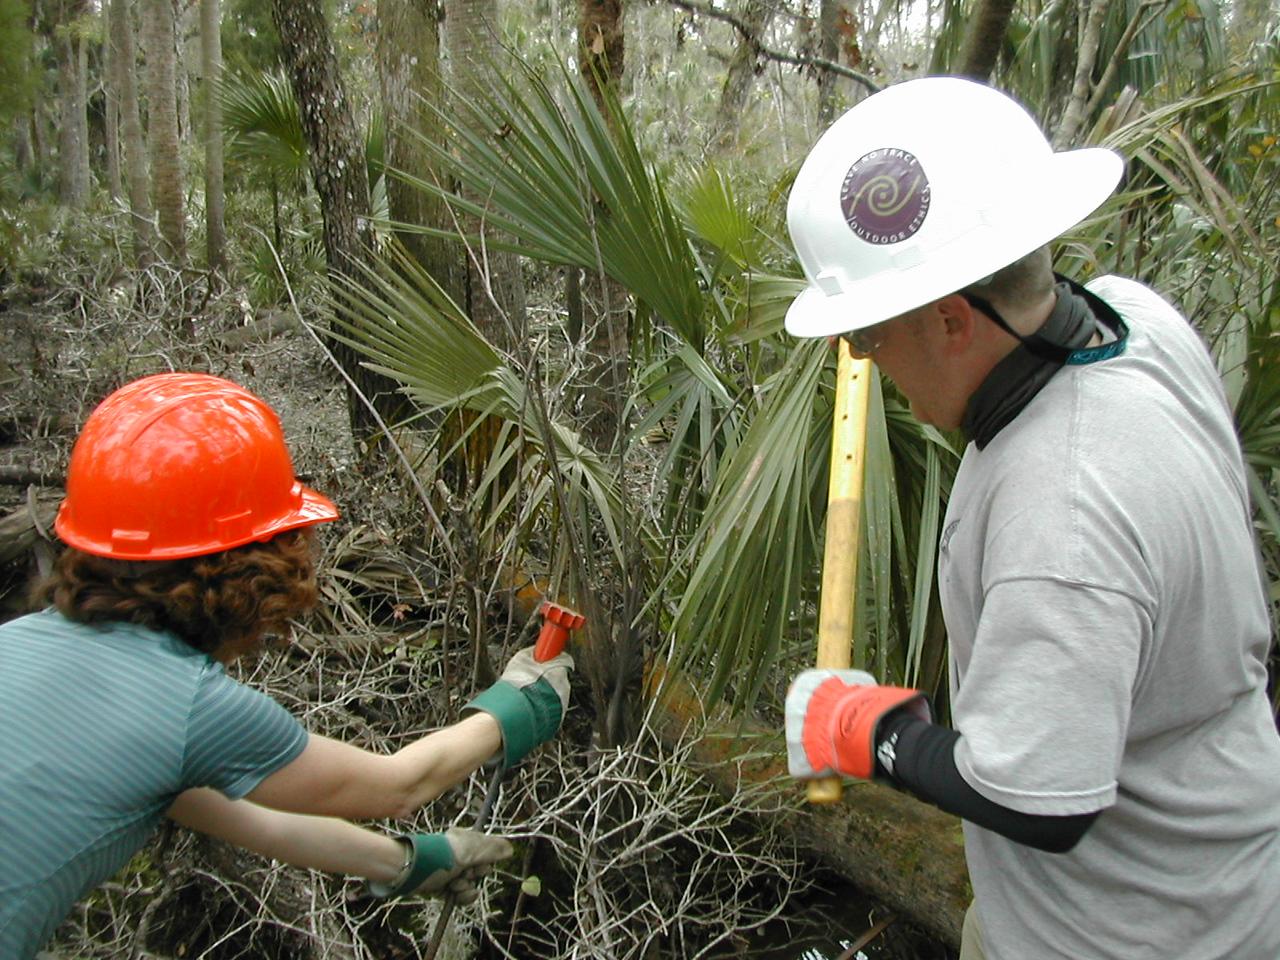 F-Troop at work<br /> PHOTO CREDIT: Sandra Friend / Florida Trail Association